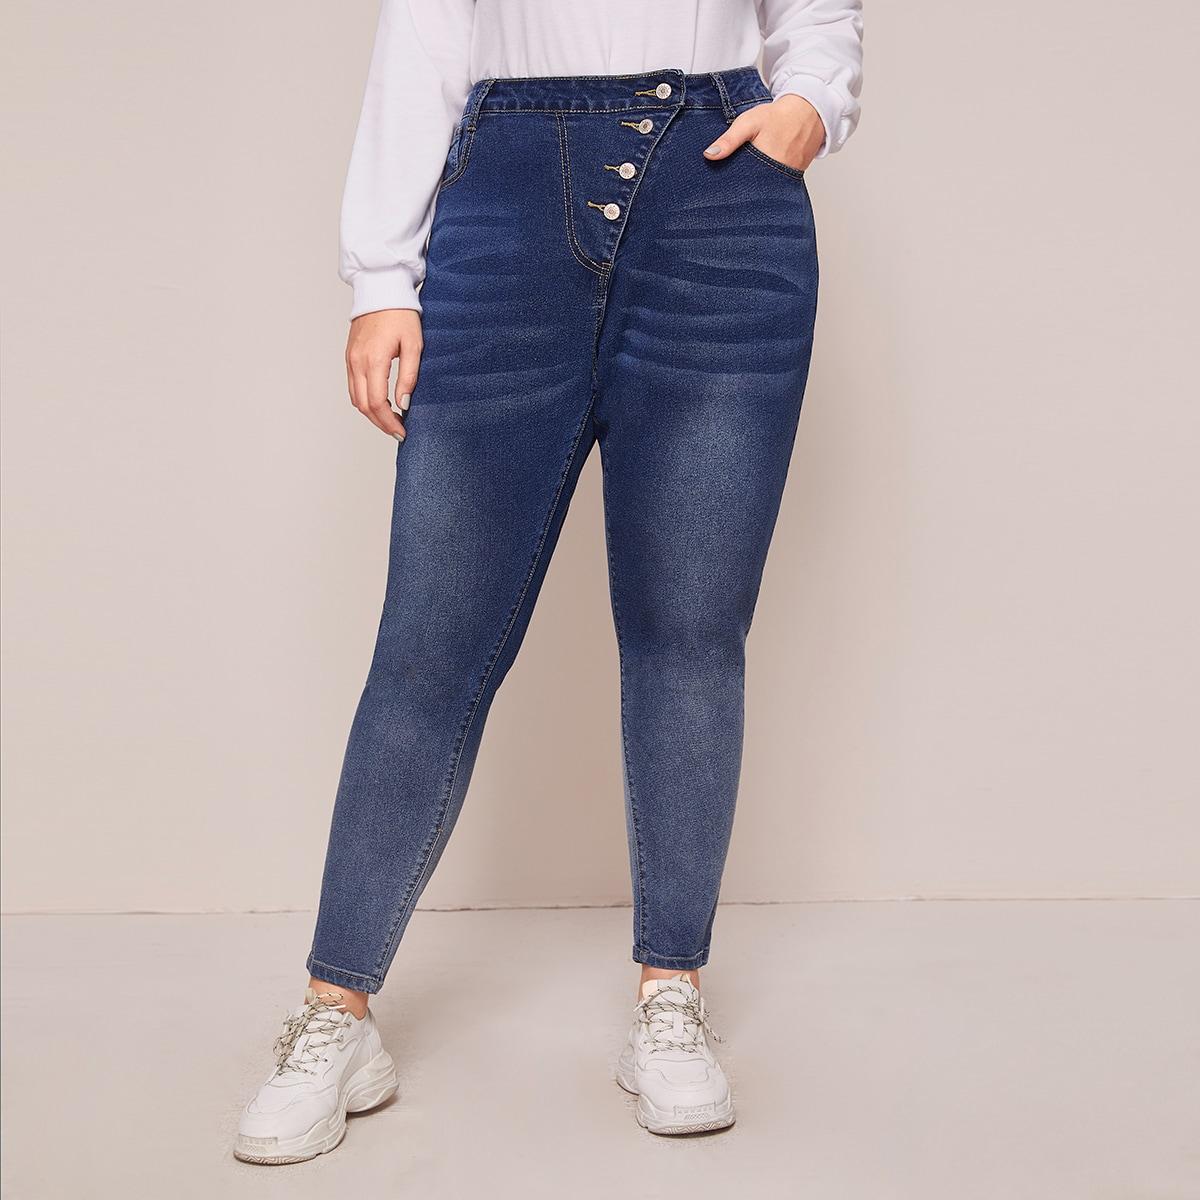 Blauw Casual Vlak Grote maten: jeans